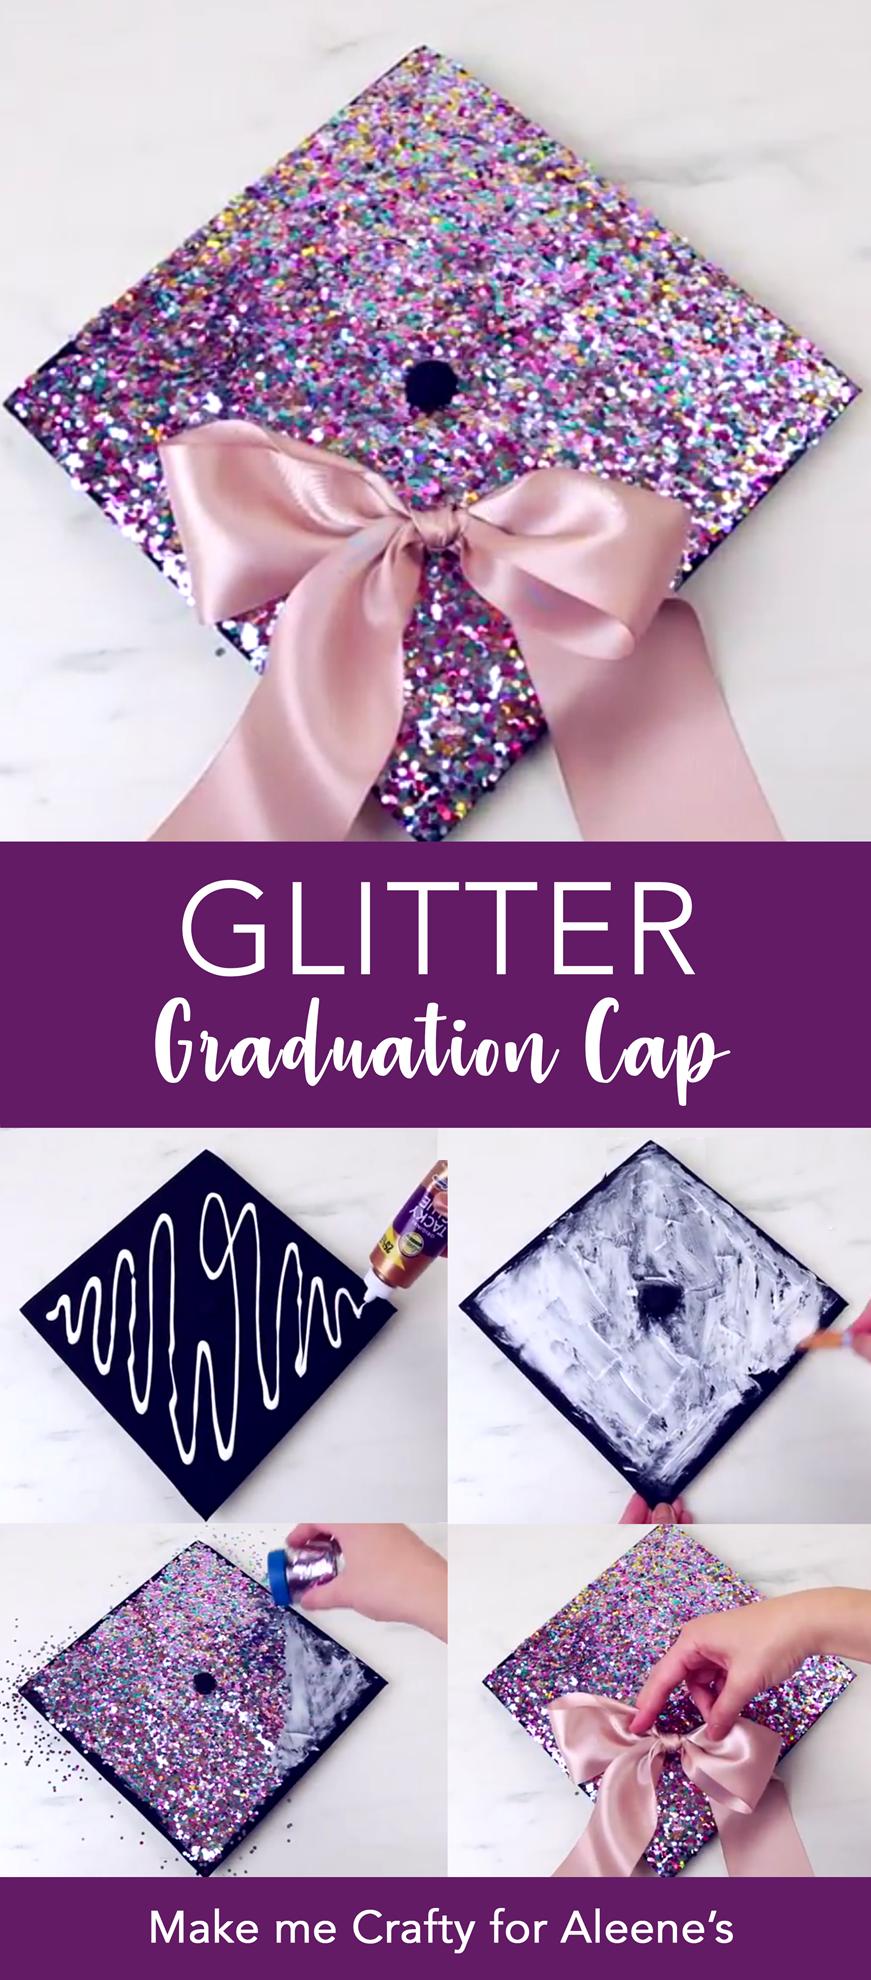 3 Ways to DIY a Graduation CapFacebookTwitterEmailPinterestMIXTumblr